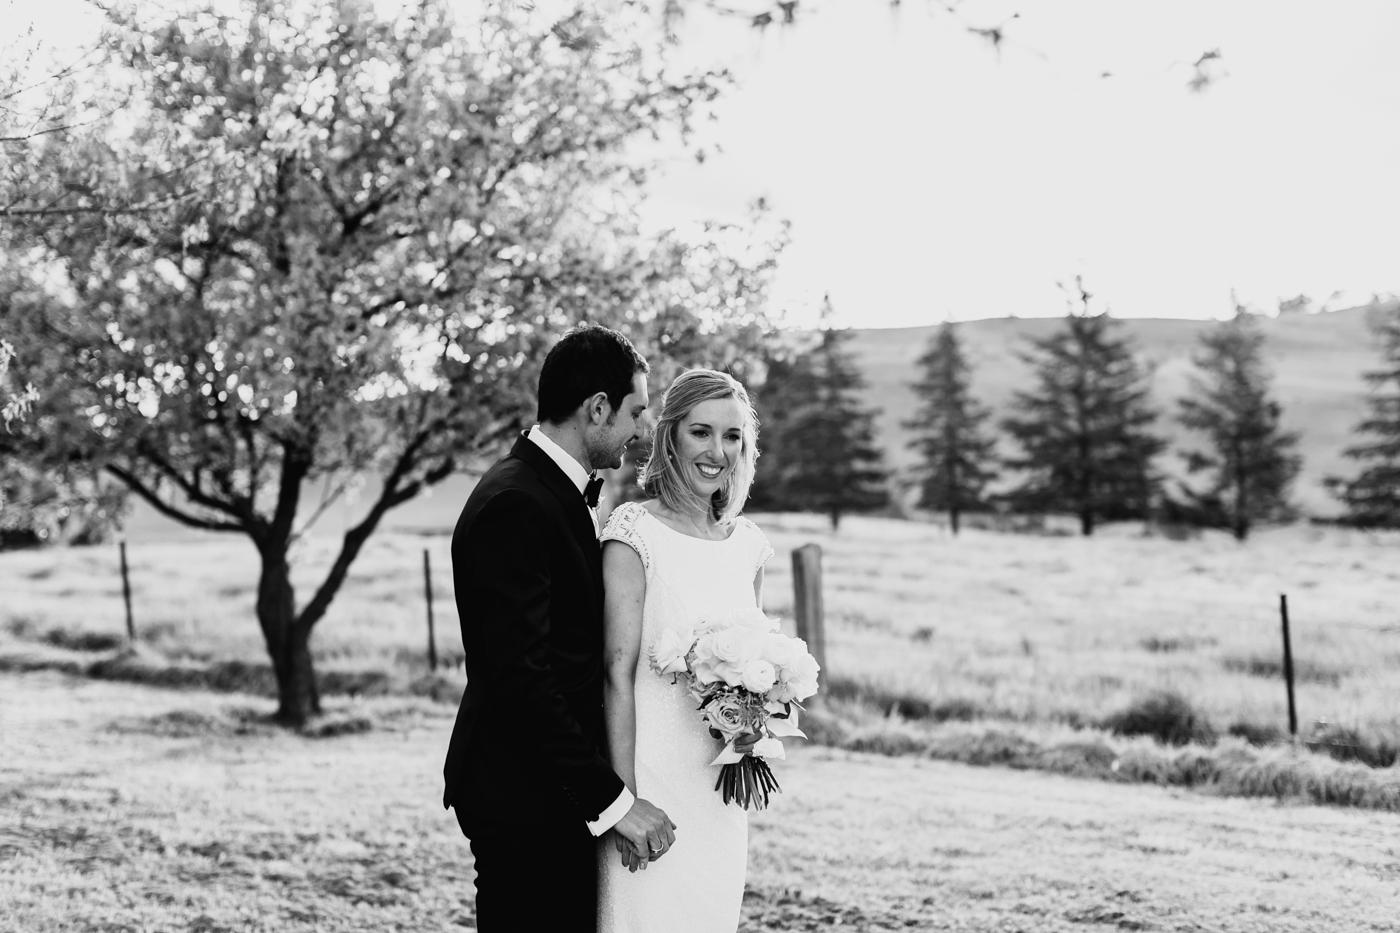 Bridget & James - Orange Country Wedding - Samantha Heather Photography-135.jpg